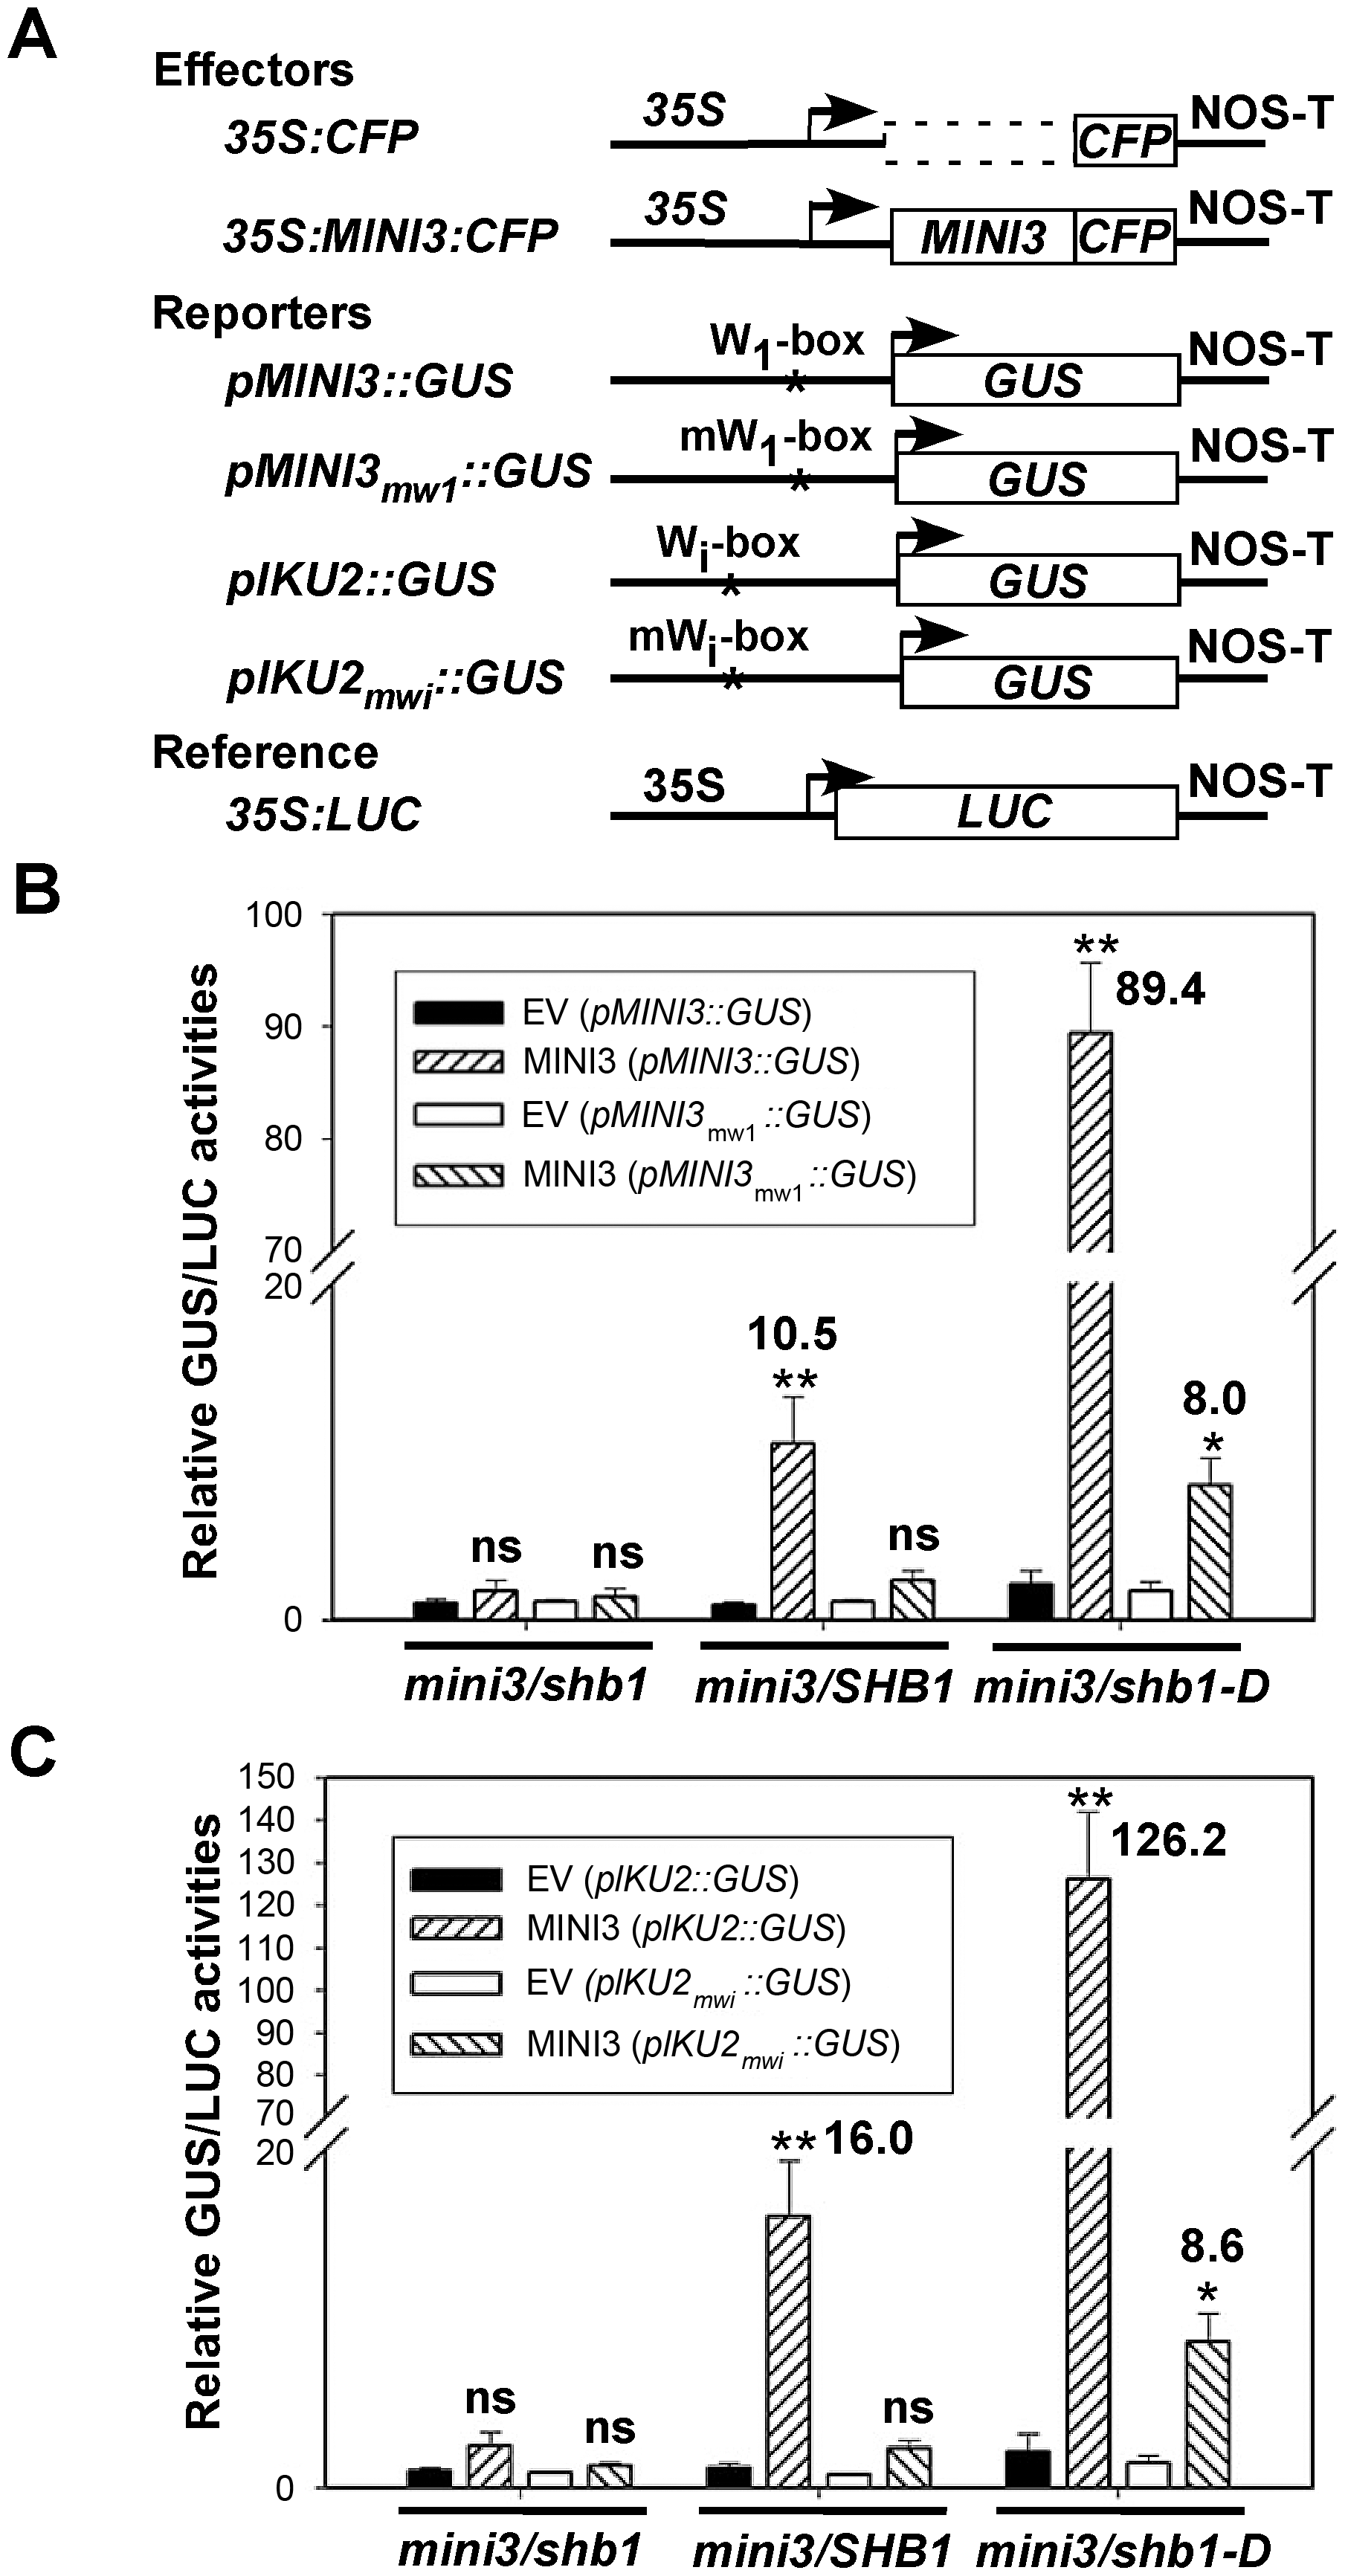 SHB1 activates transcription from <i>MINI3</i> and <i>IKU2</i> promoters.